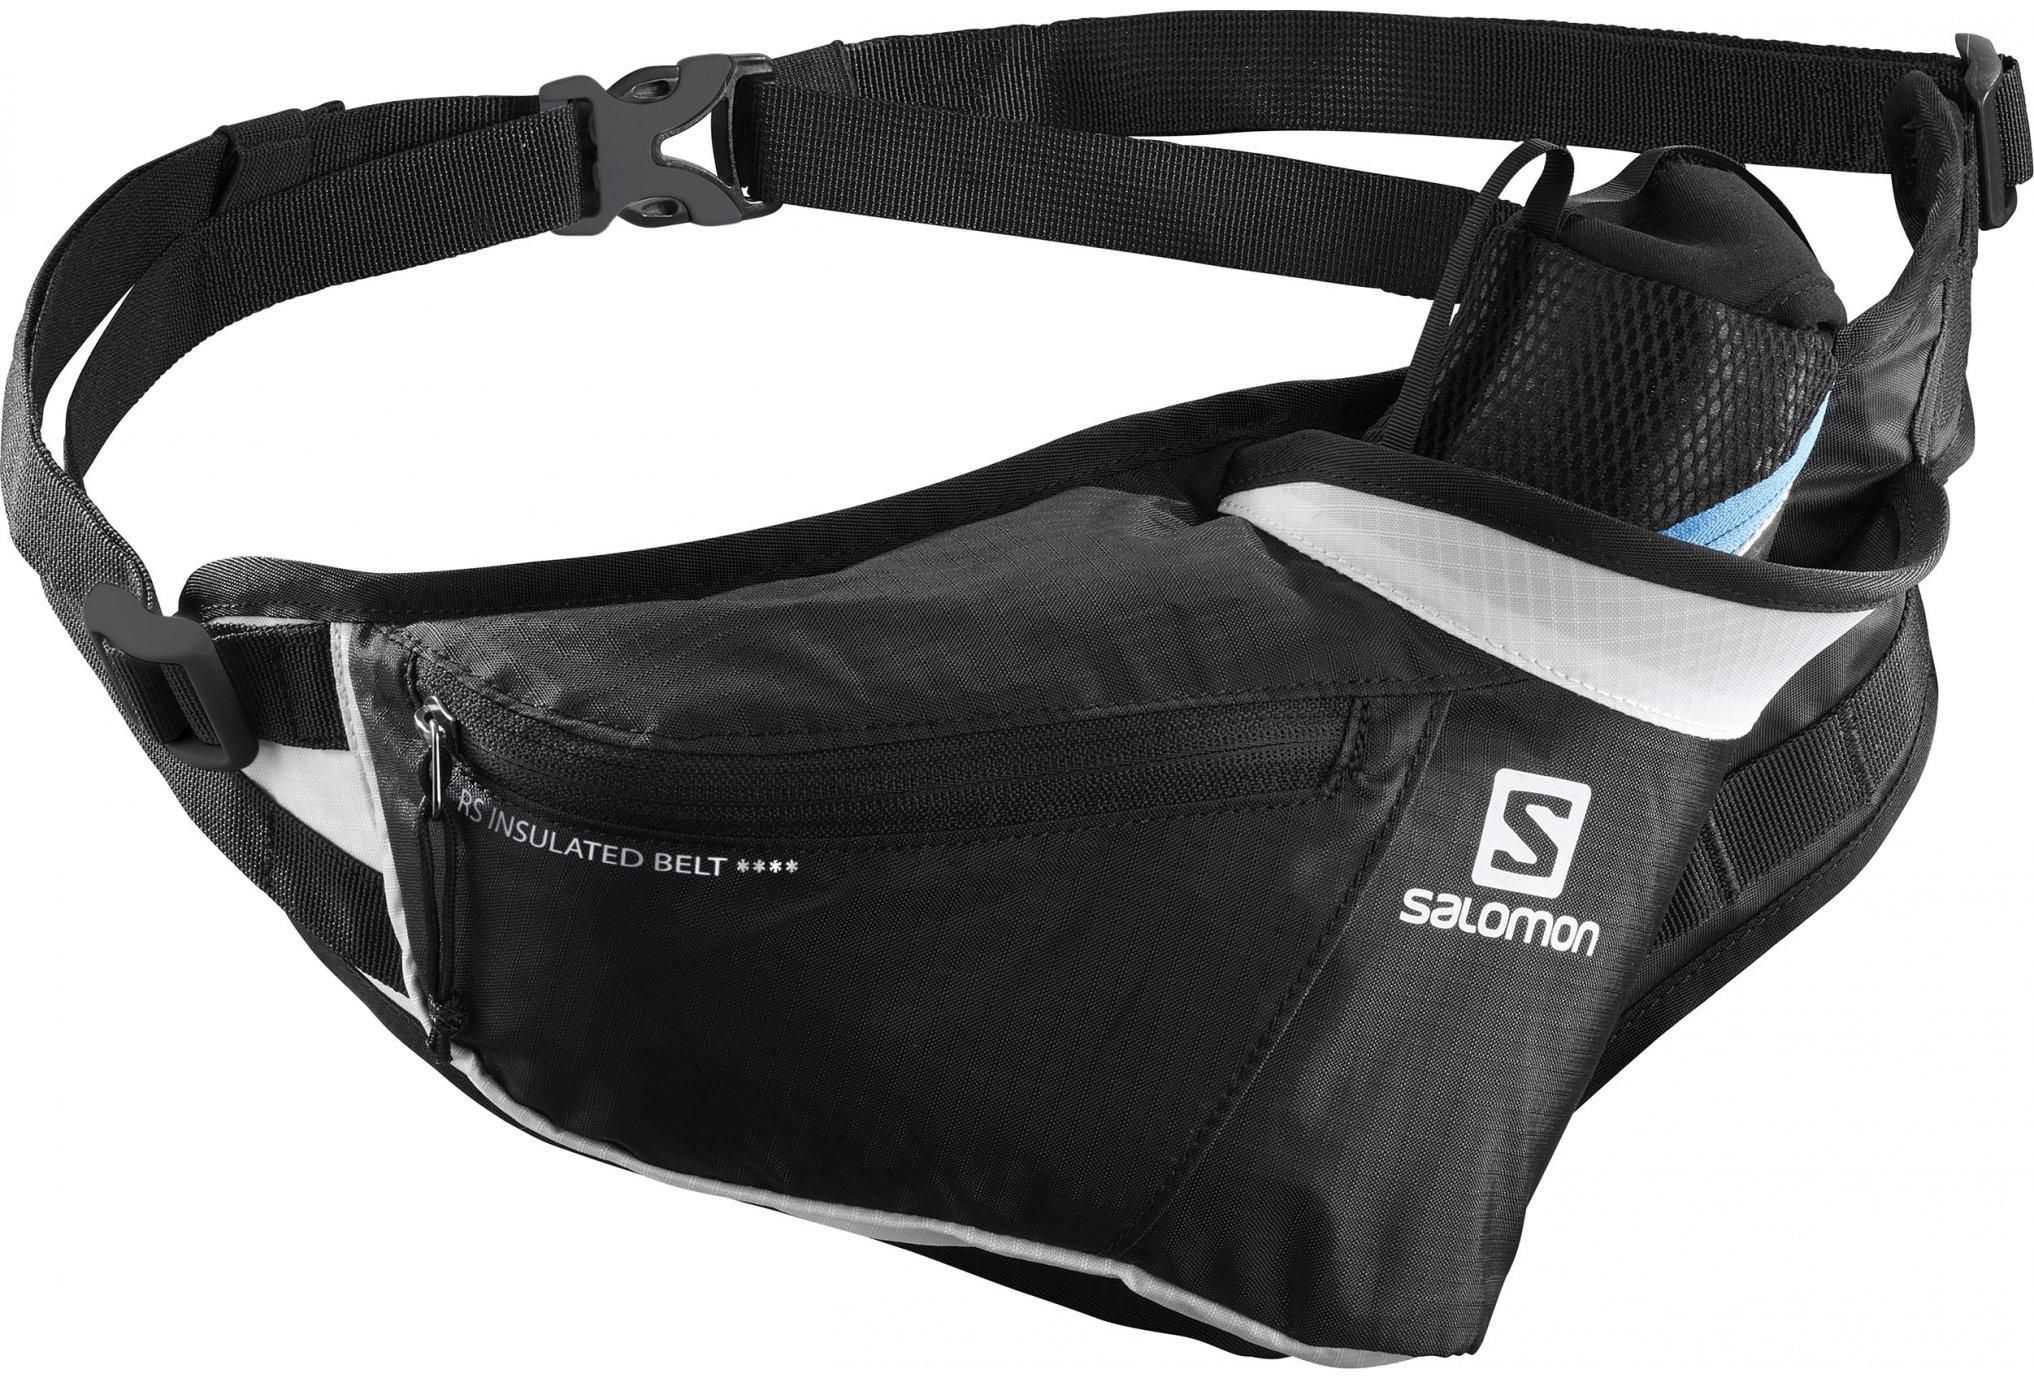 Salomon RS Insulated Belt Sac hydratation / Gourde